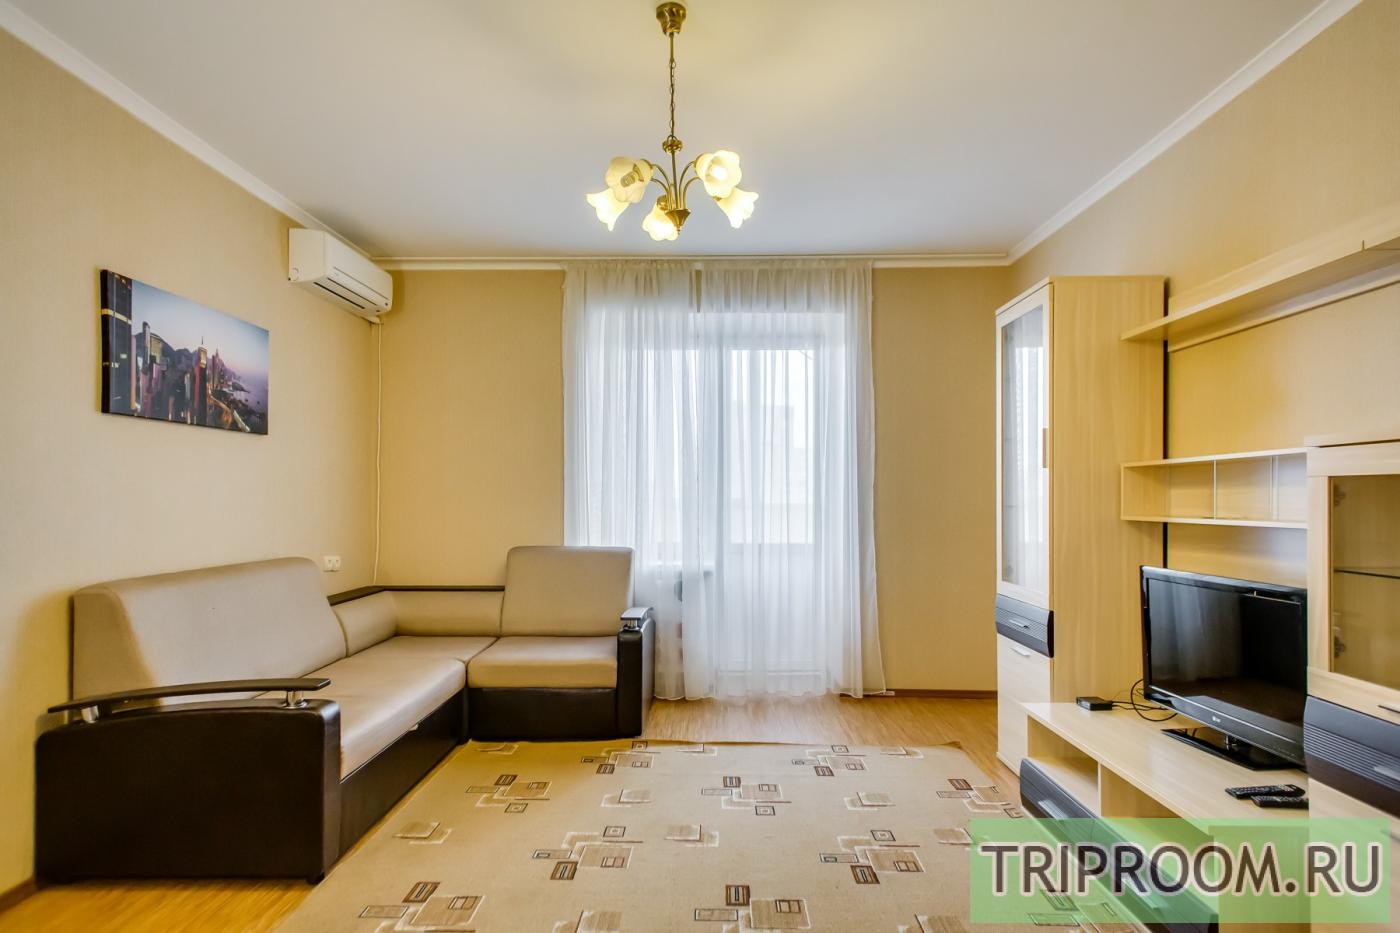 2-комнатная квартира посуточно (вариант № 23730), ул. Максима Горького улица, фото № 2